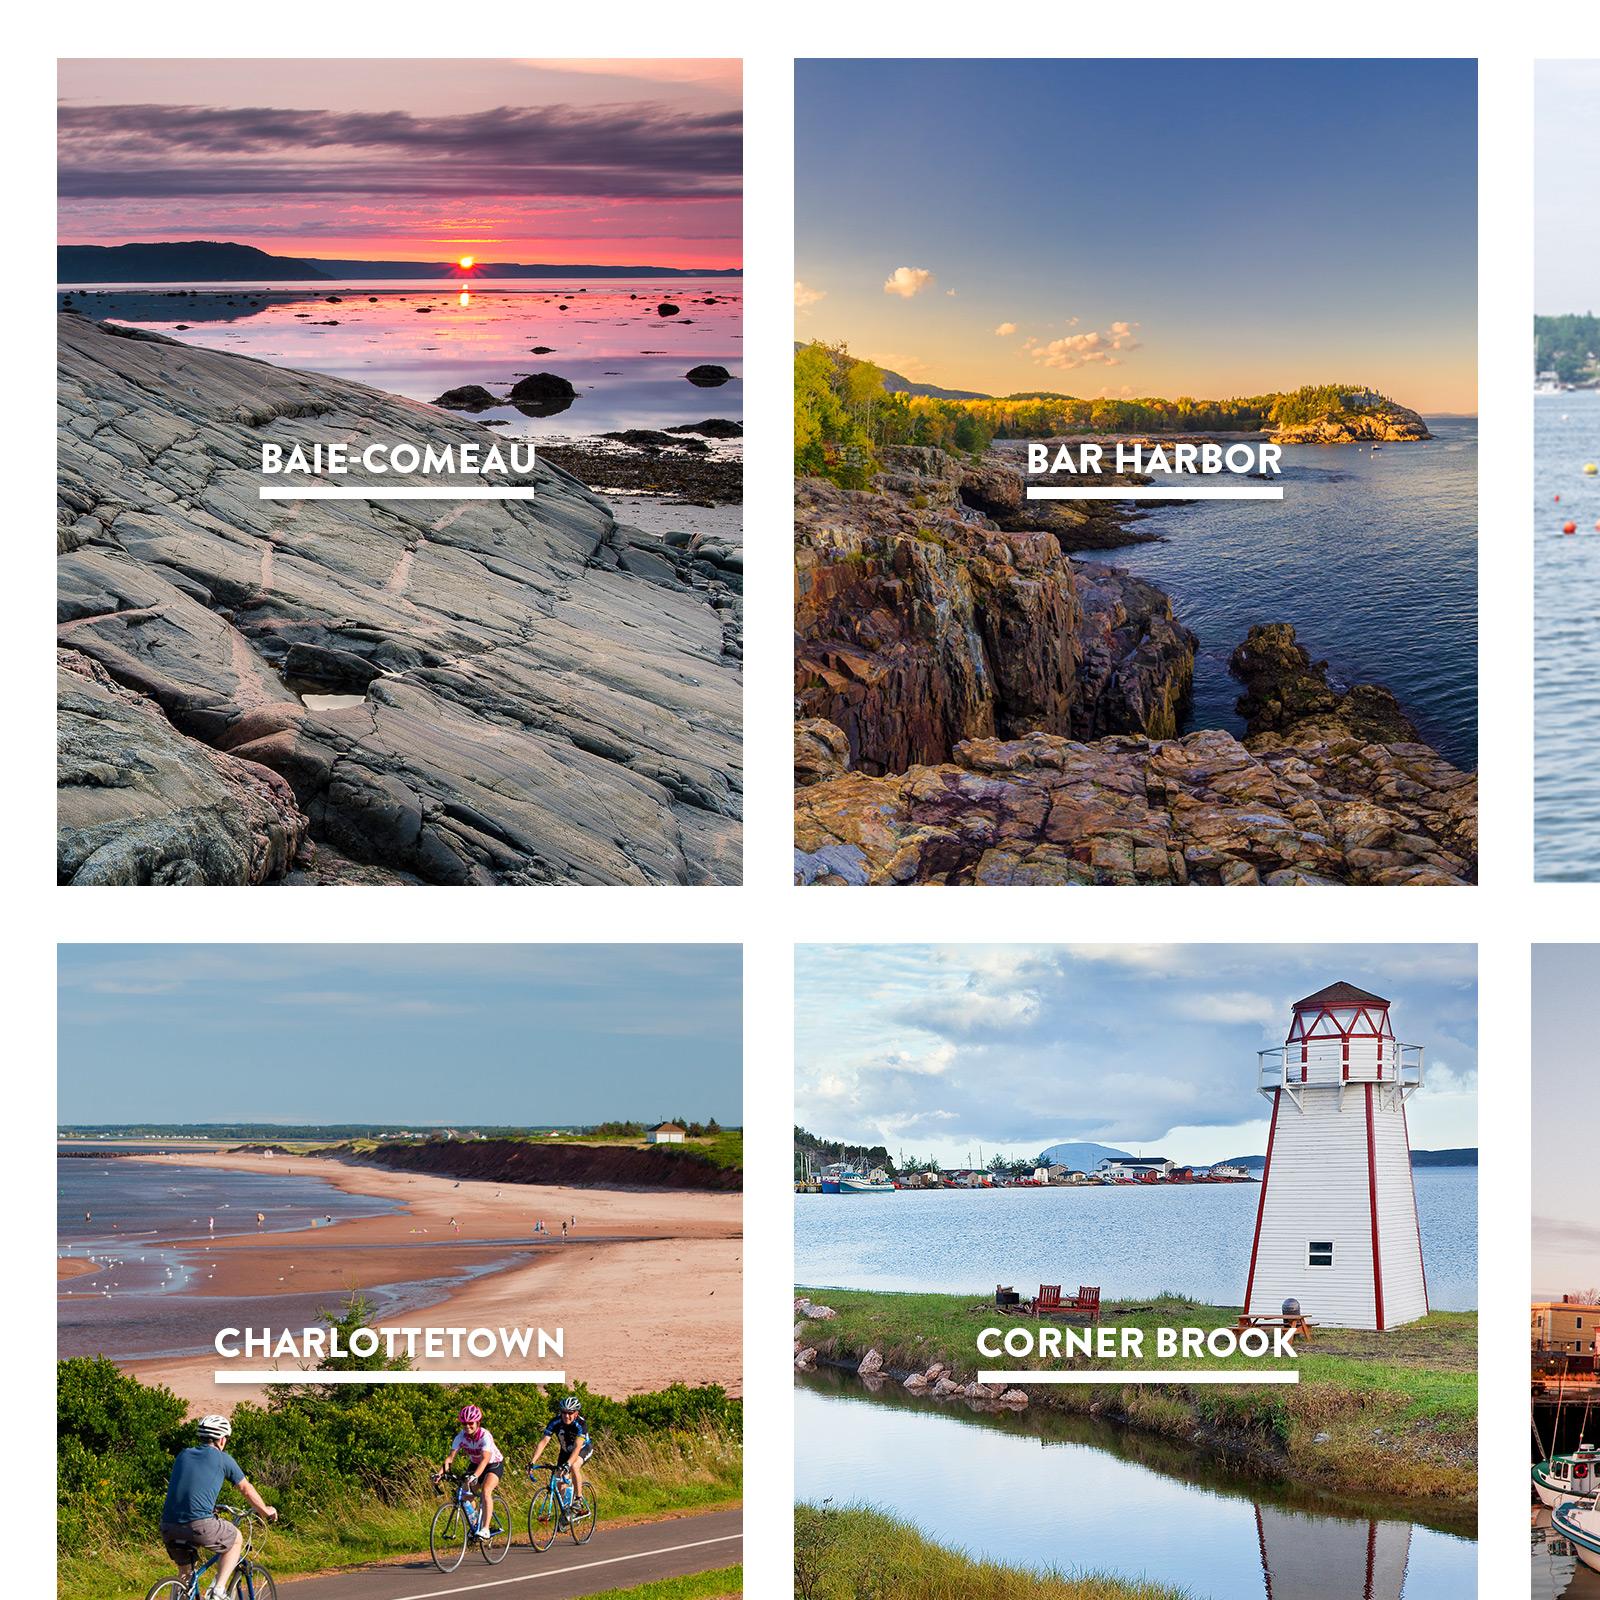 Cruise Canada New England